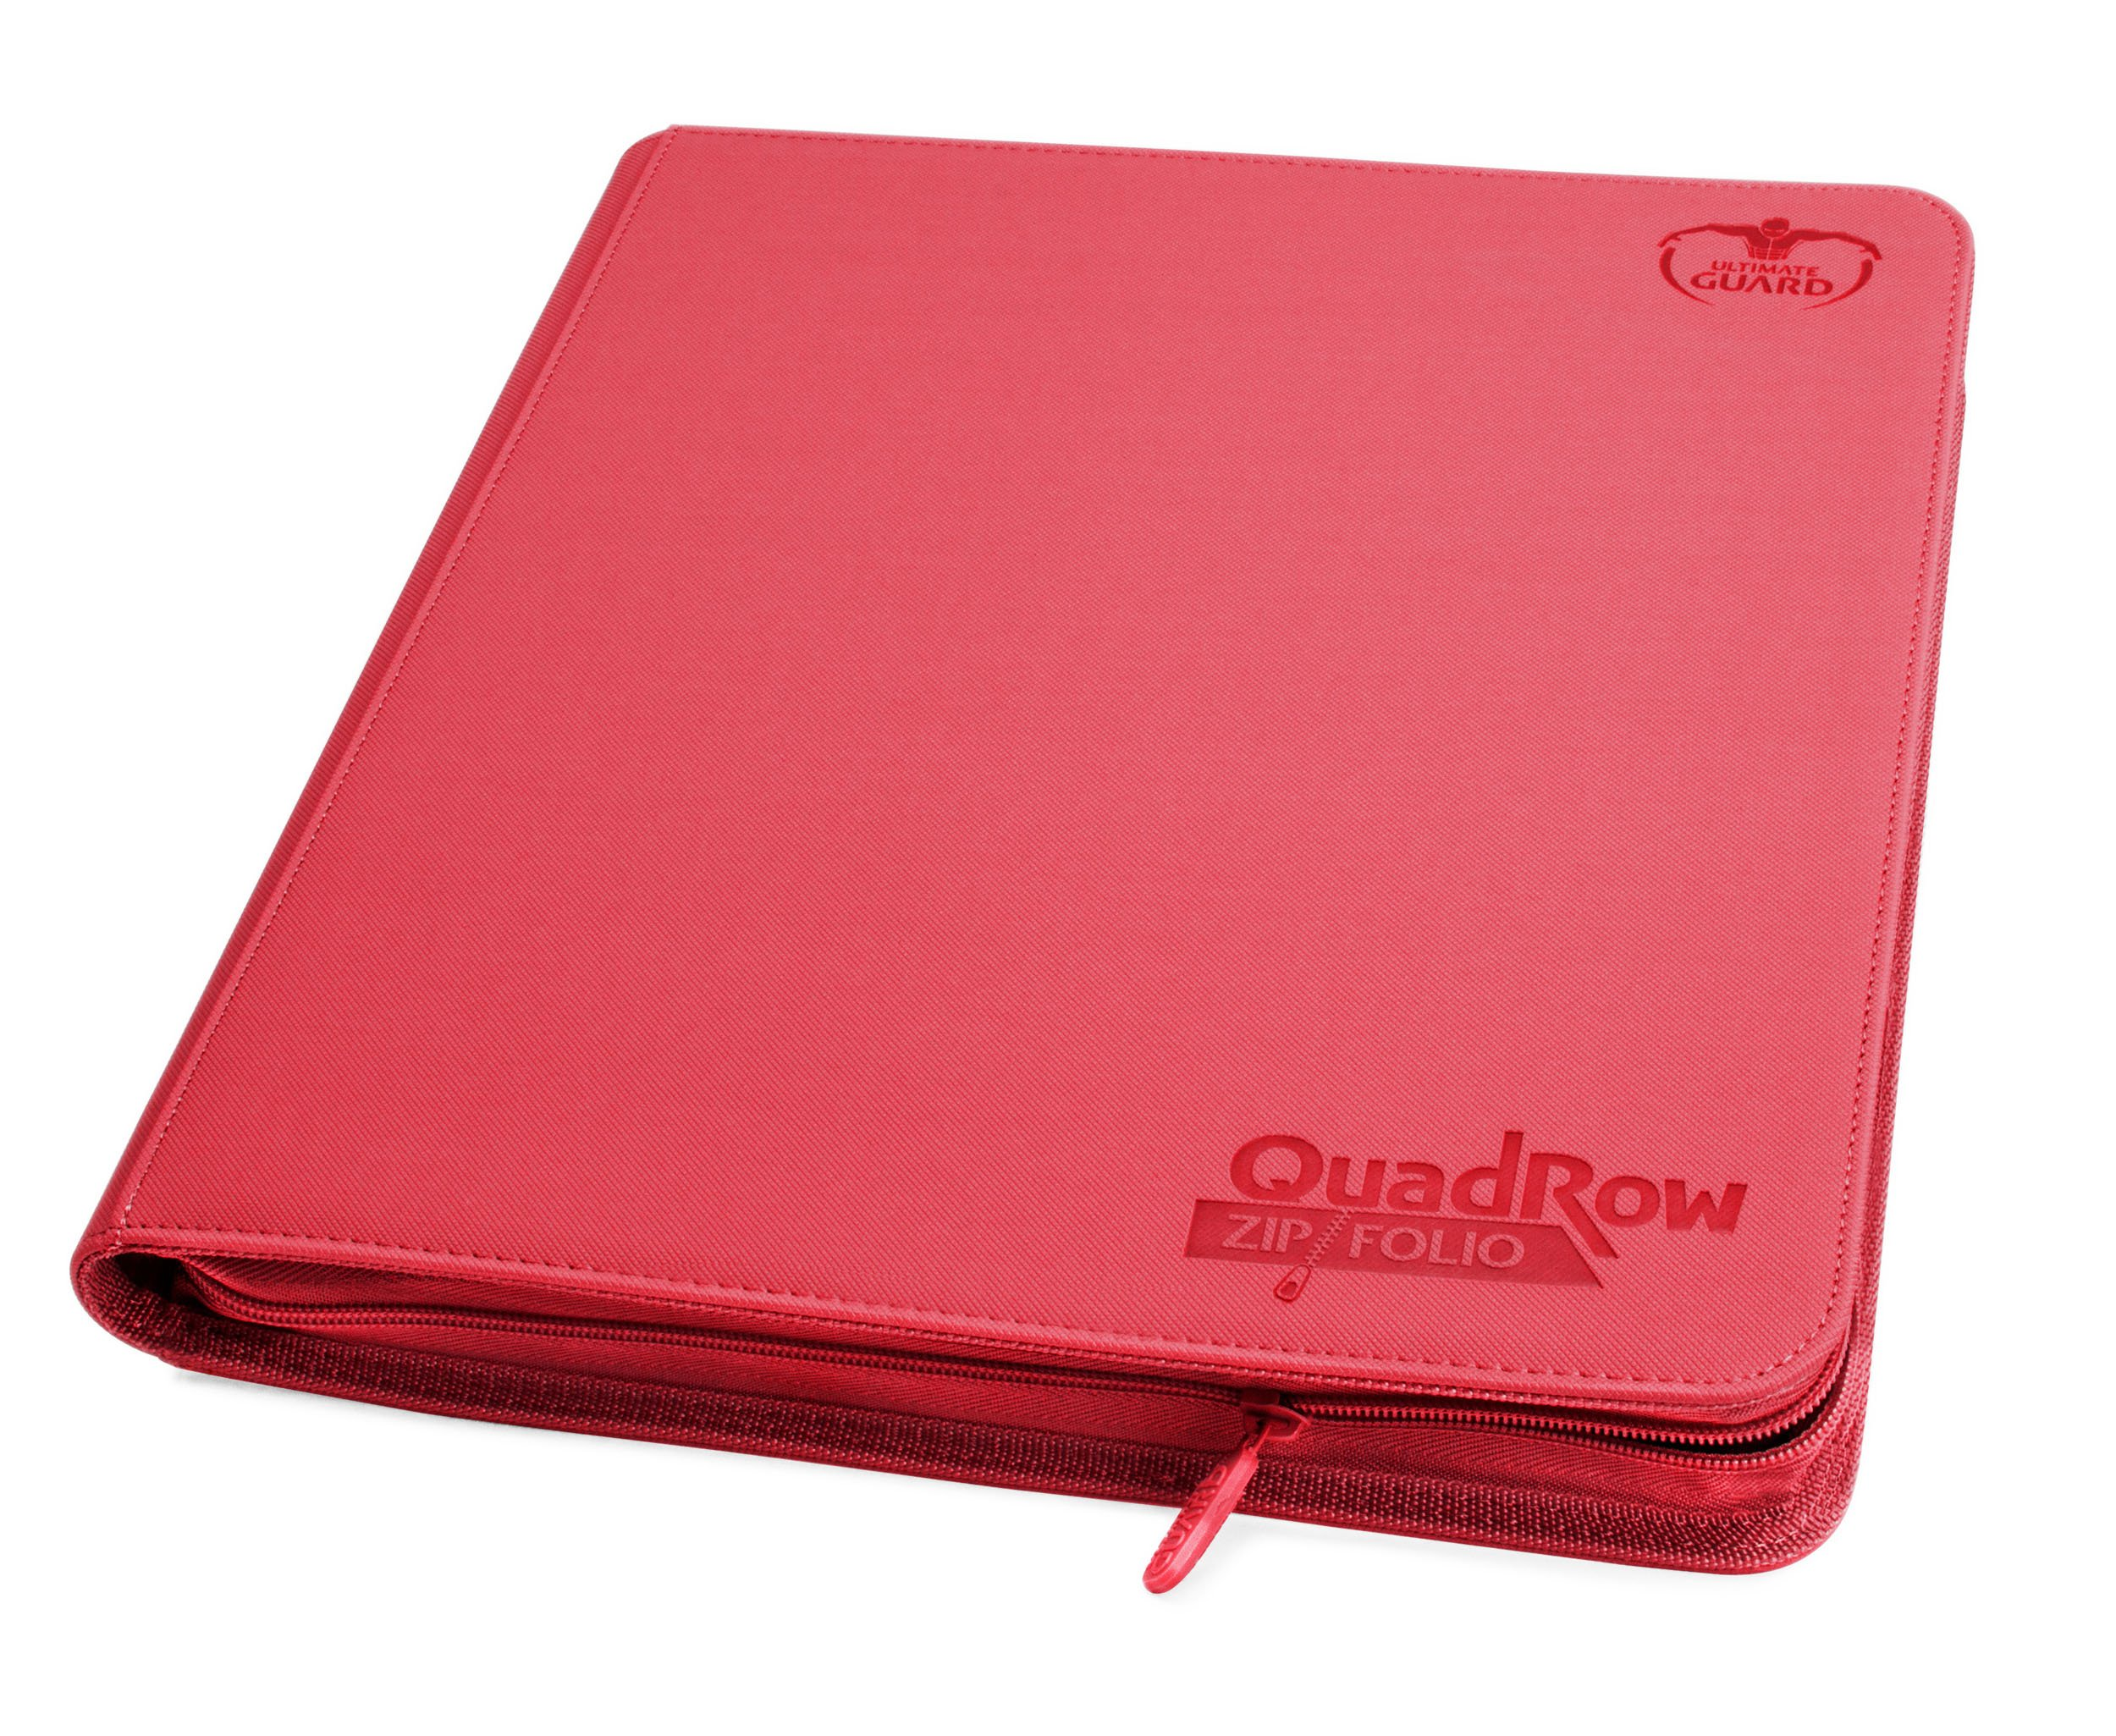 Quad row Zipfolio Xenoskin Card Sleeves, Red